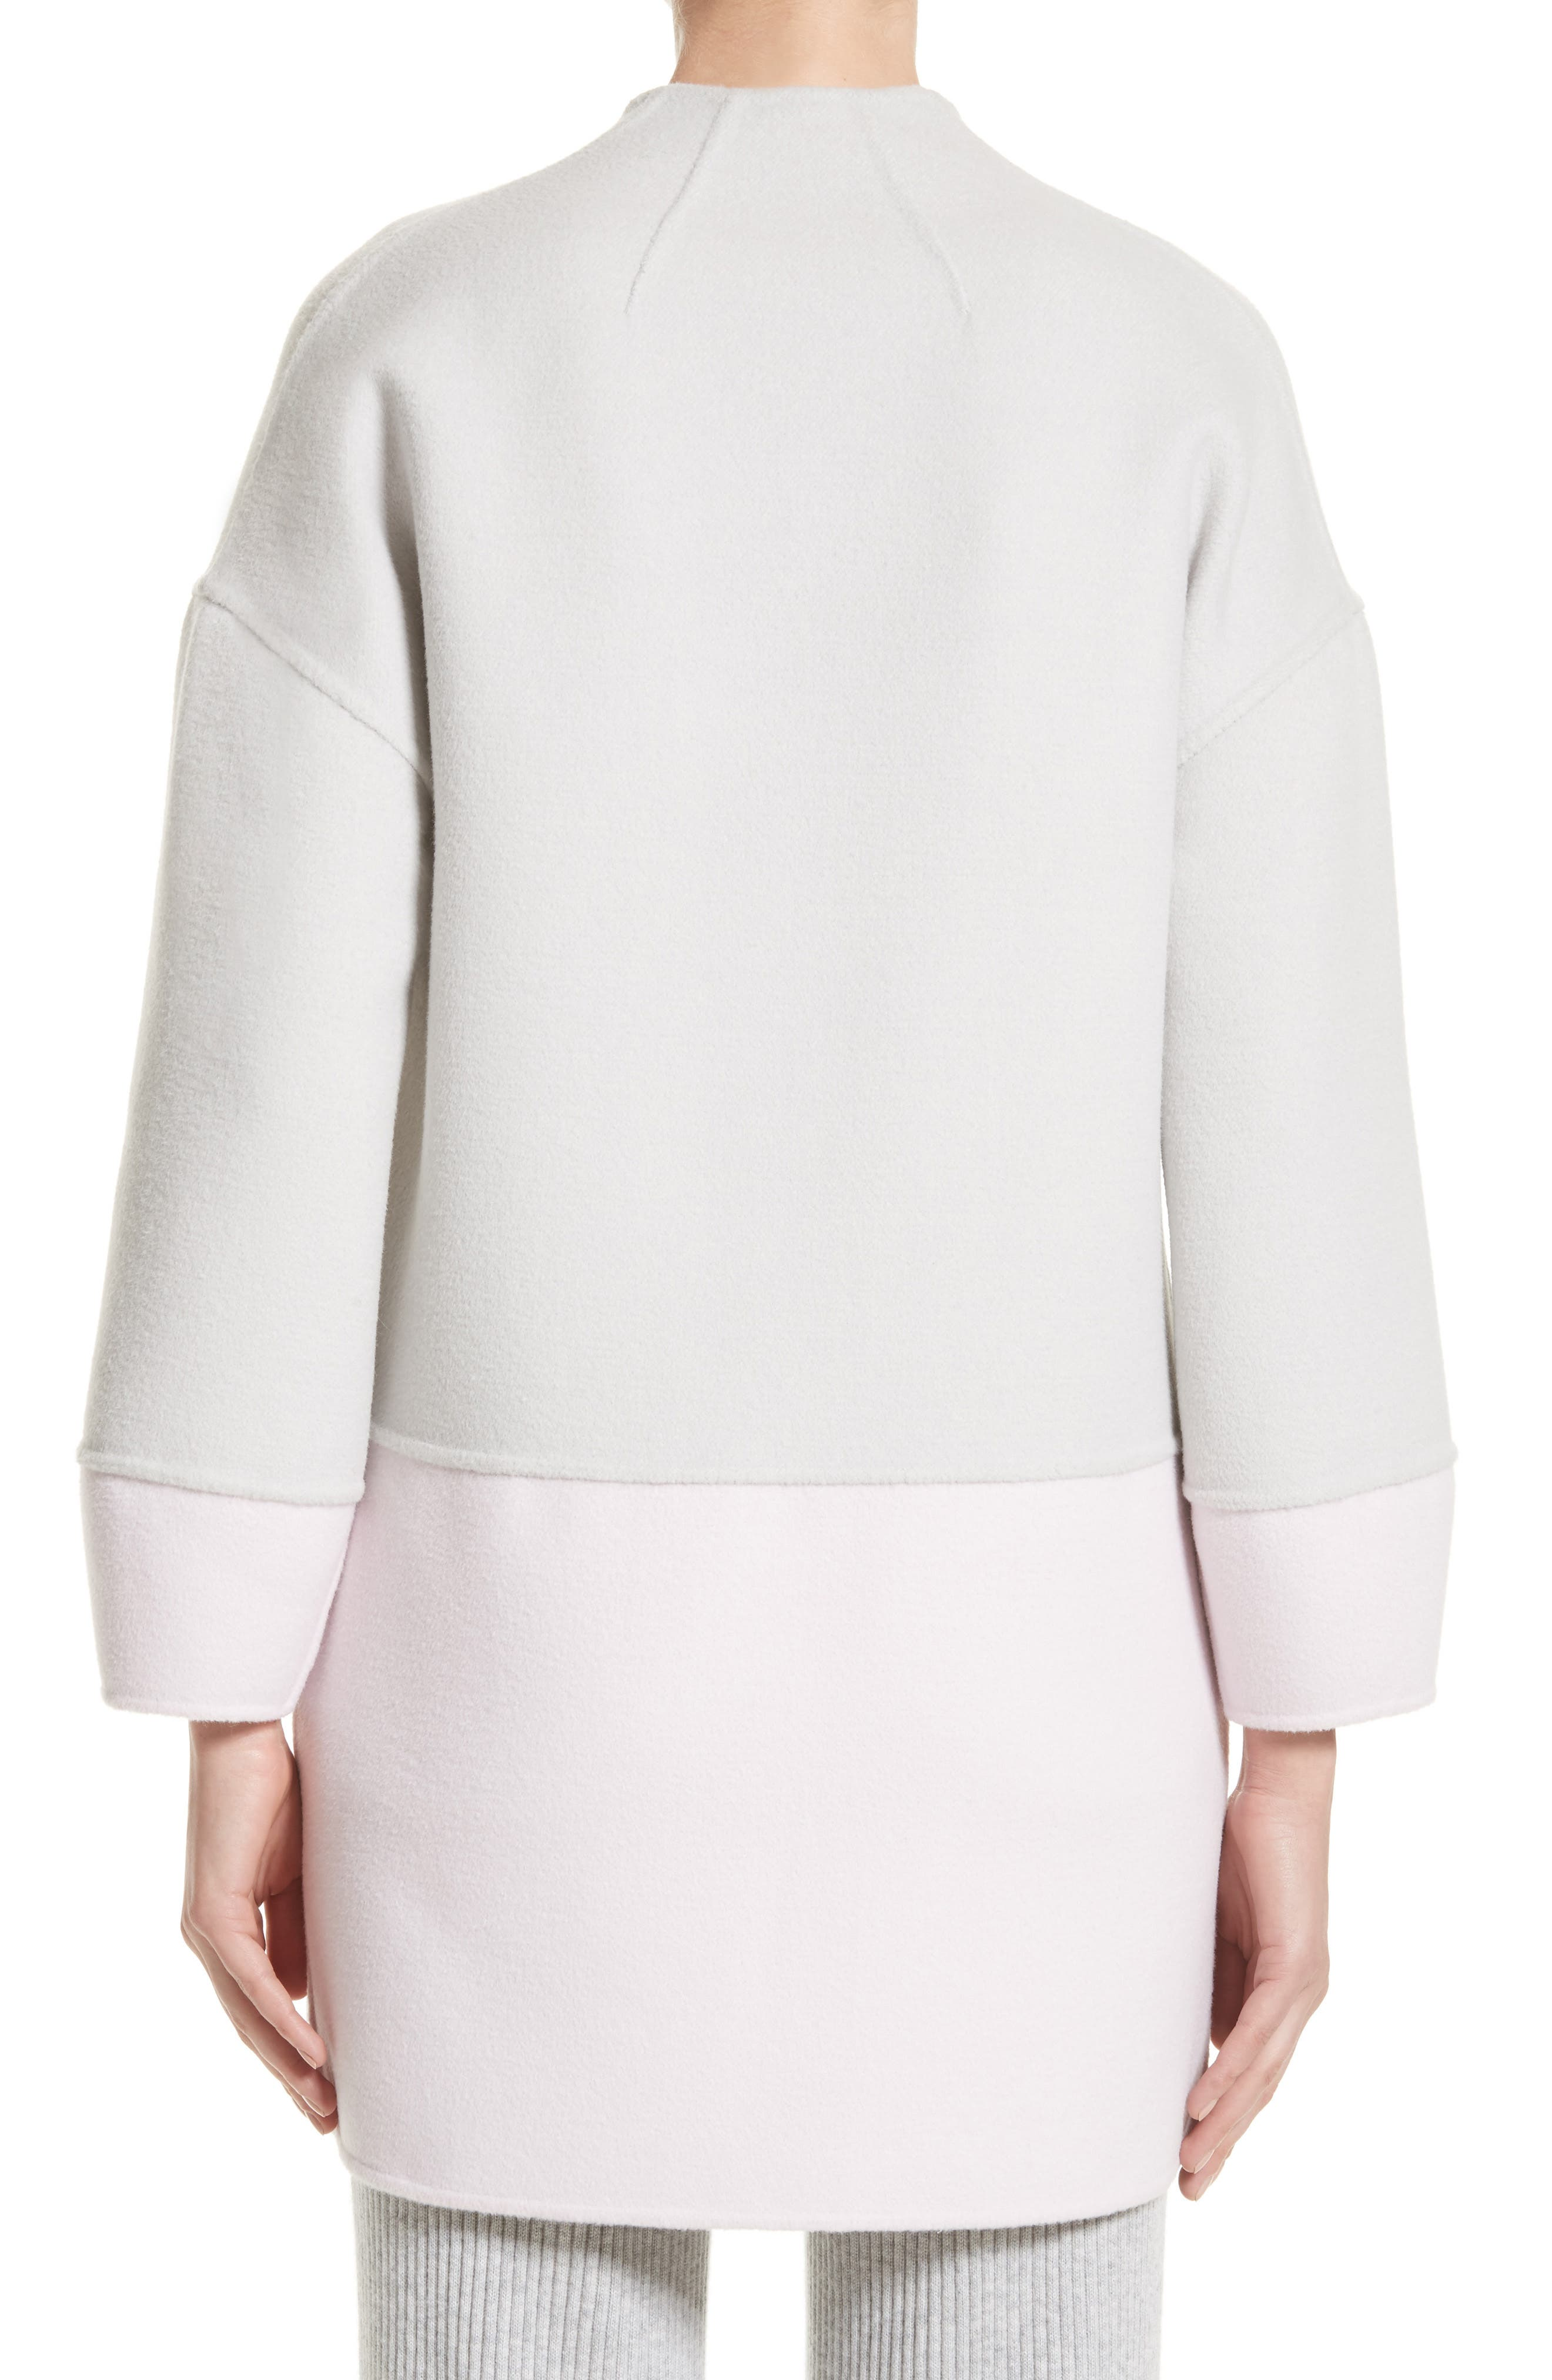 Reversible Wool Blend Cocoon Coat,                             Alternate thumbnail 2, color,                             Petal/ Light Grey Melange